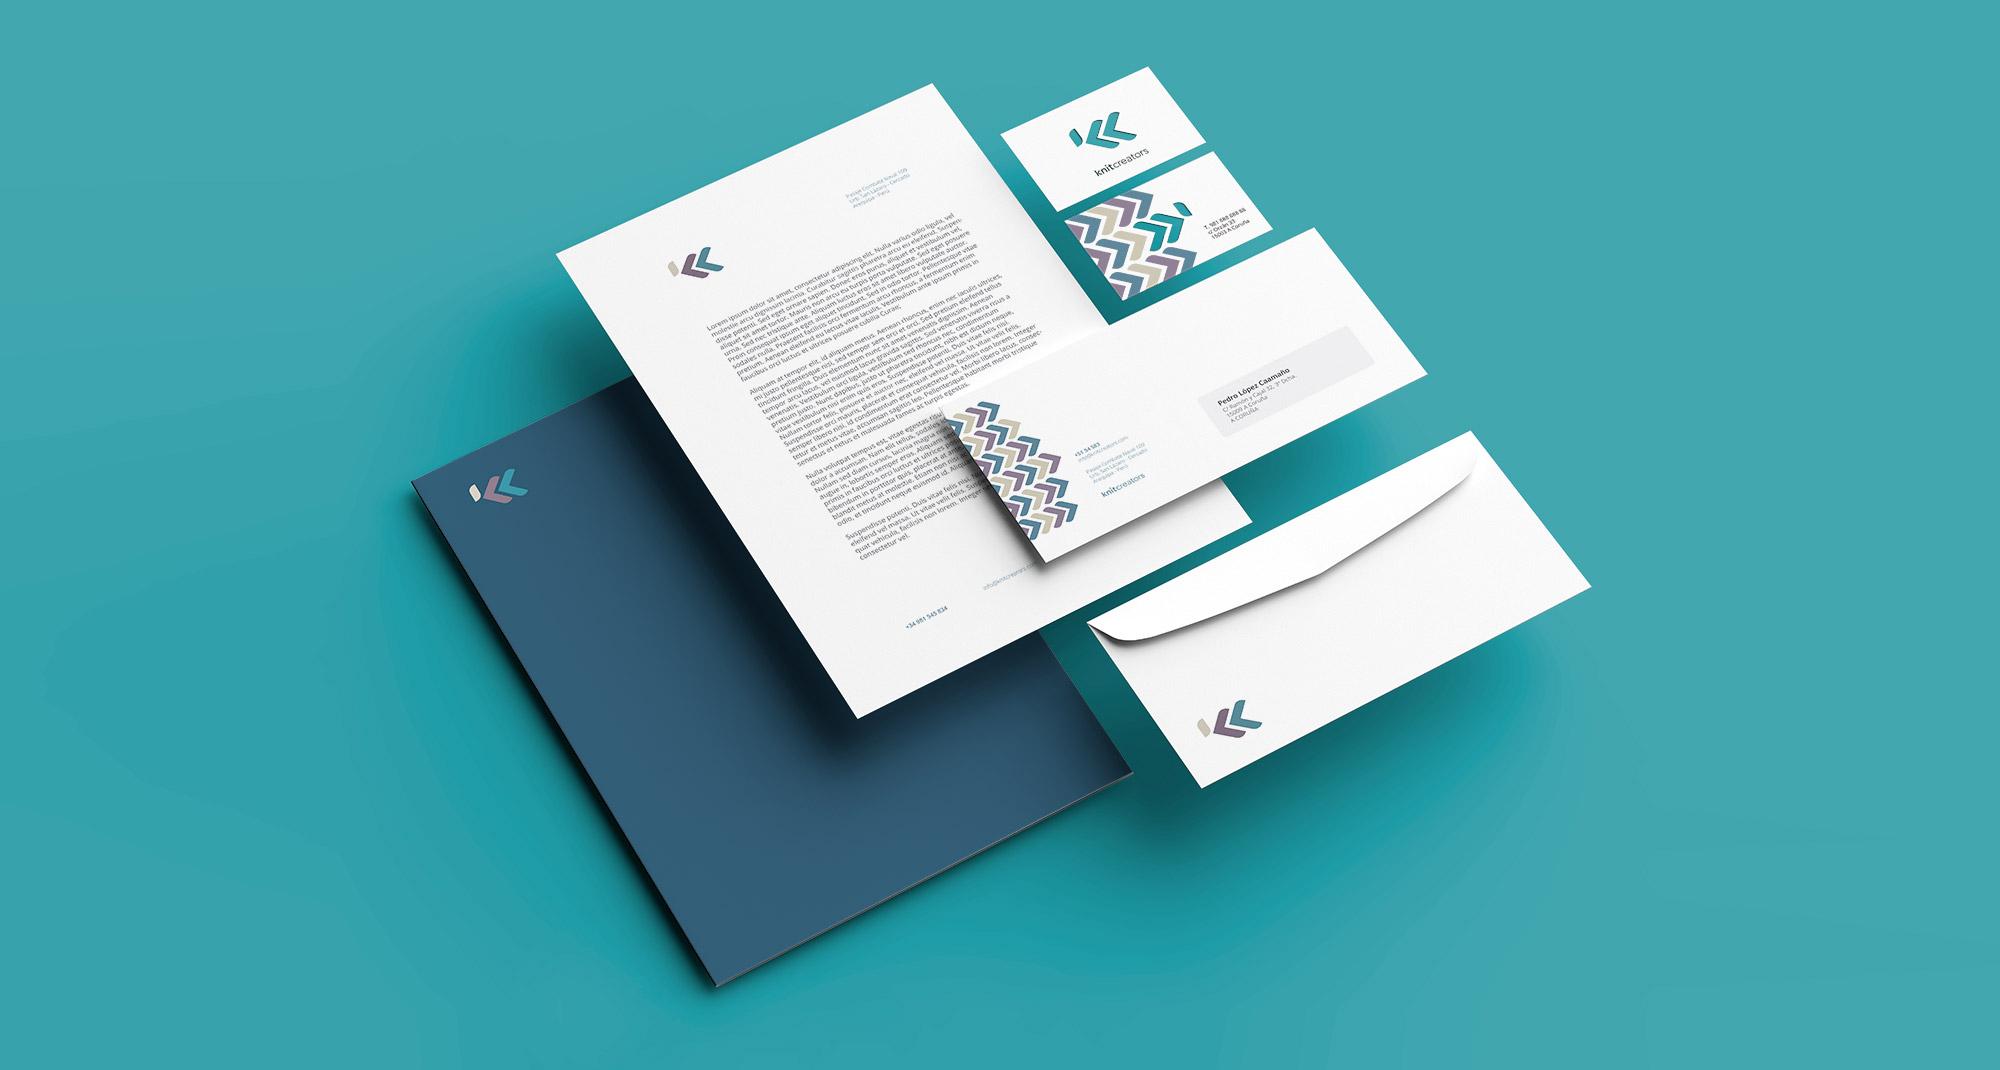 Diseño de papeleria de marca